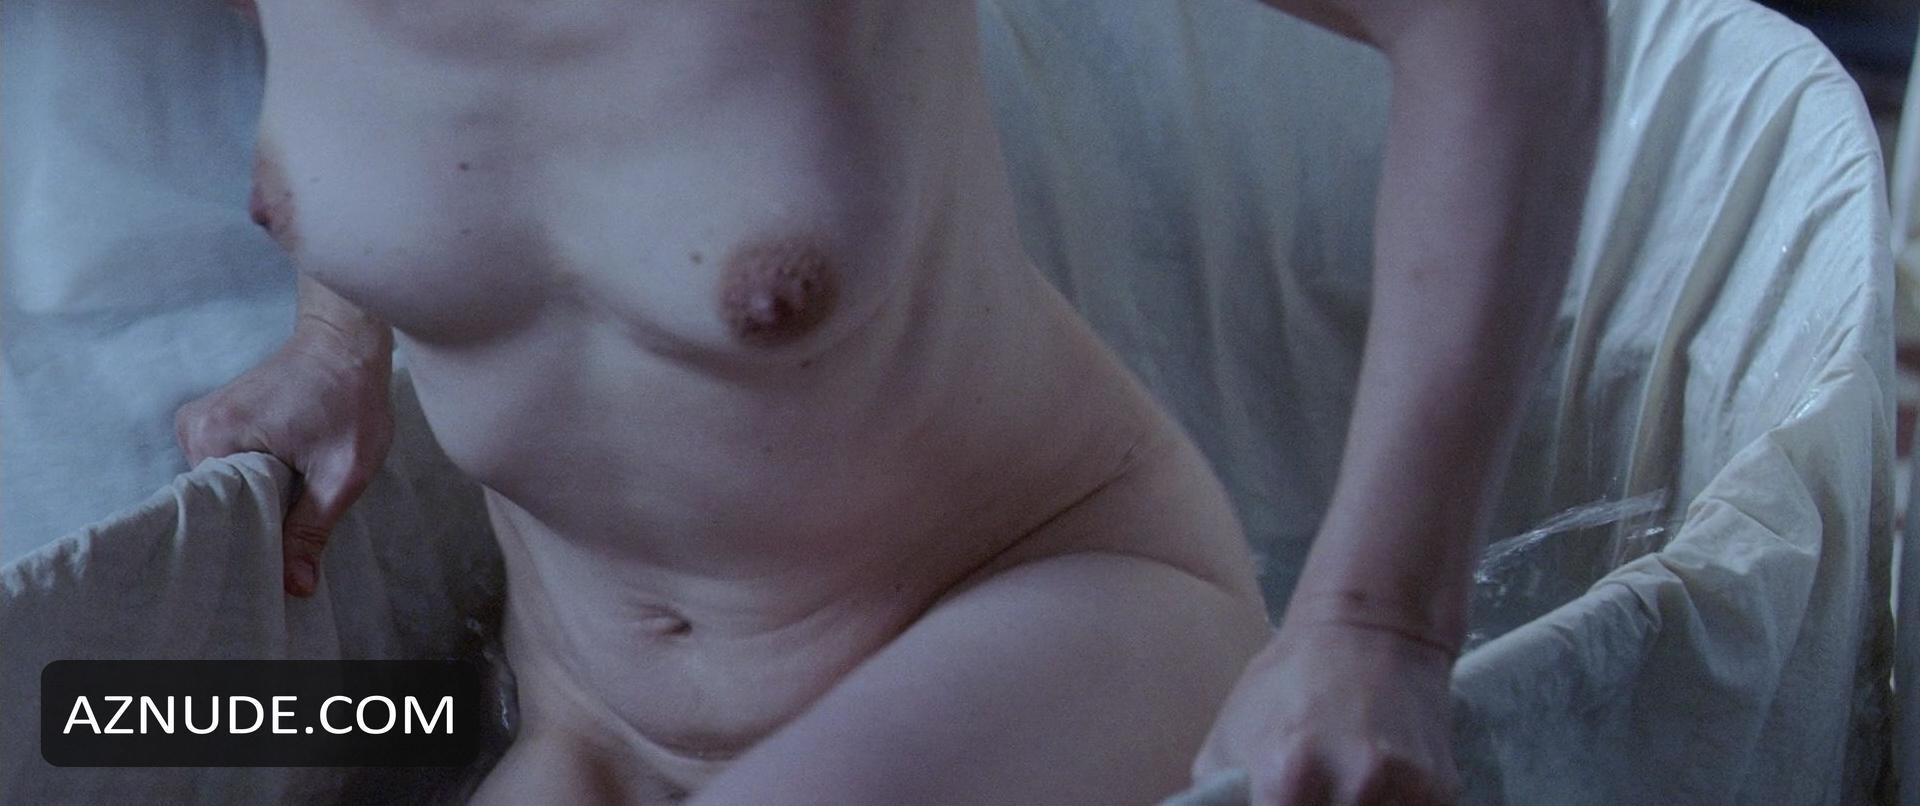 Thought differently, Juliette Binoche sex porn